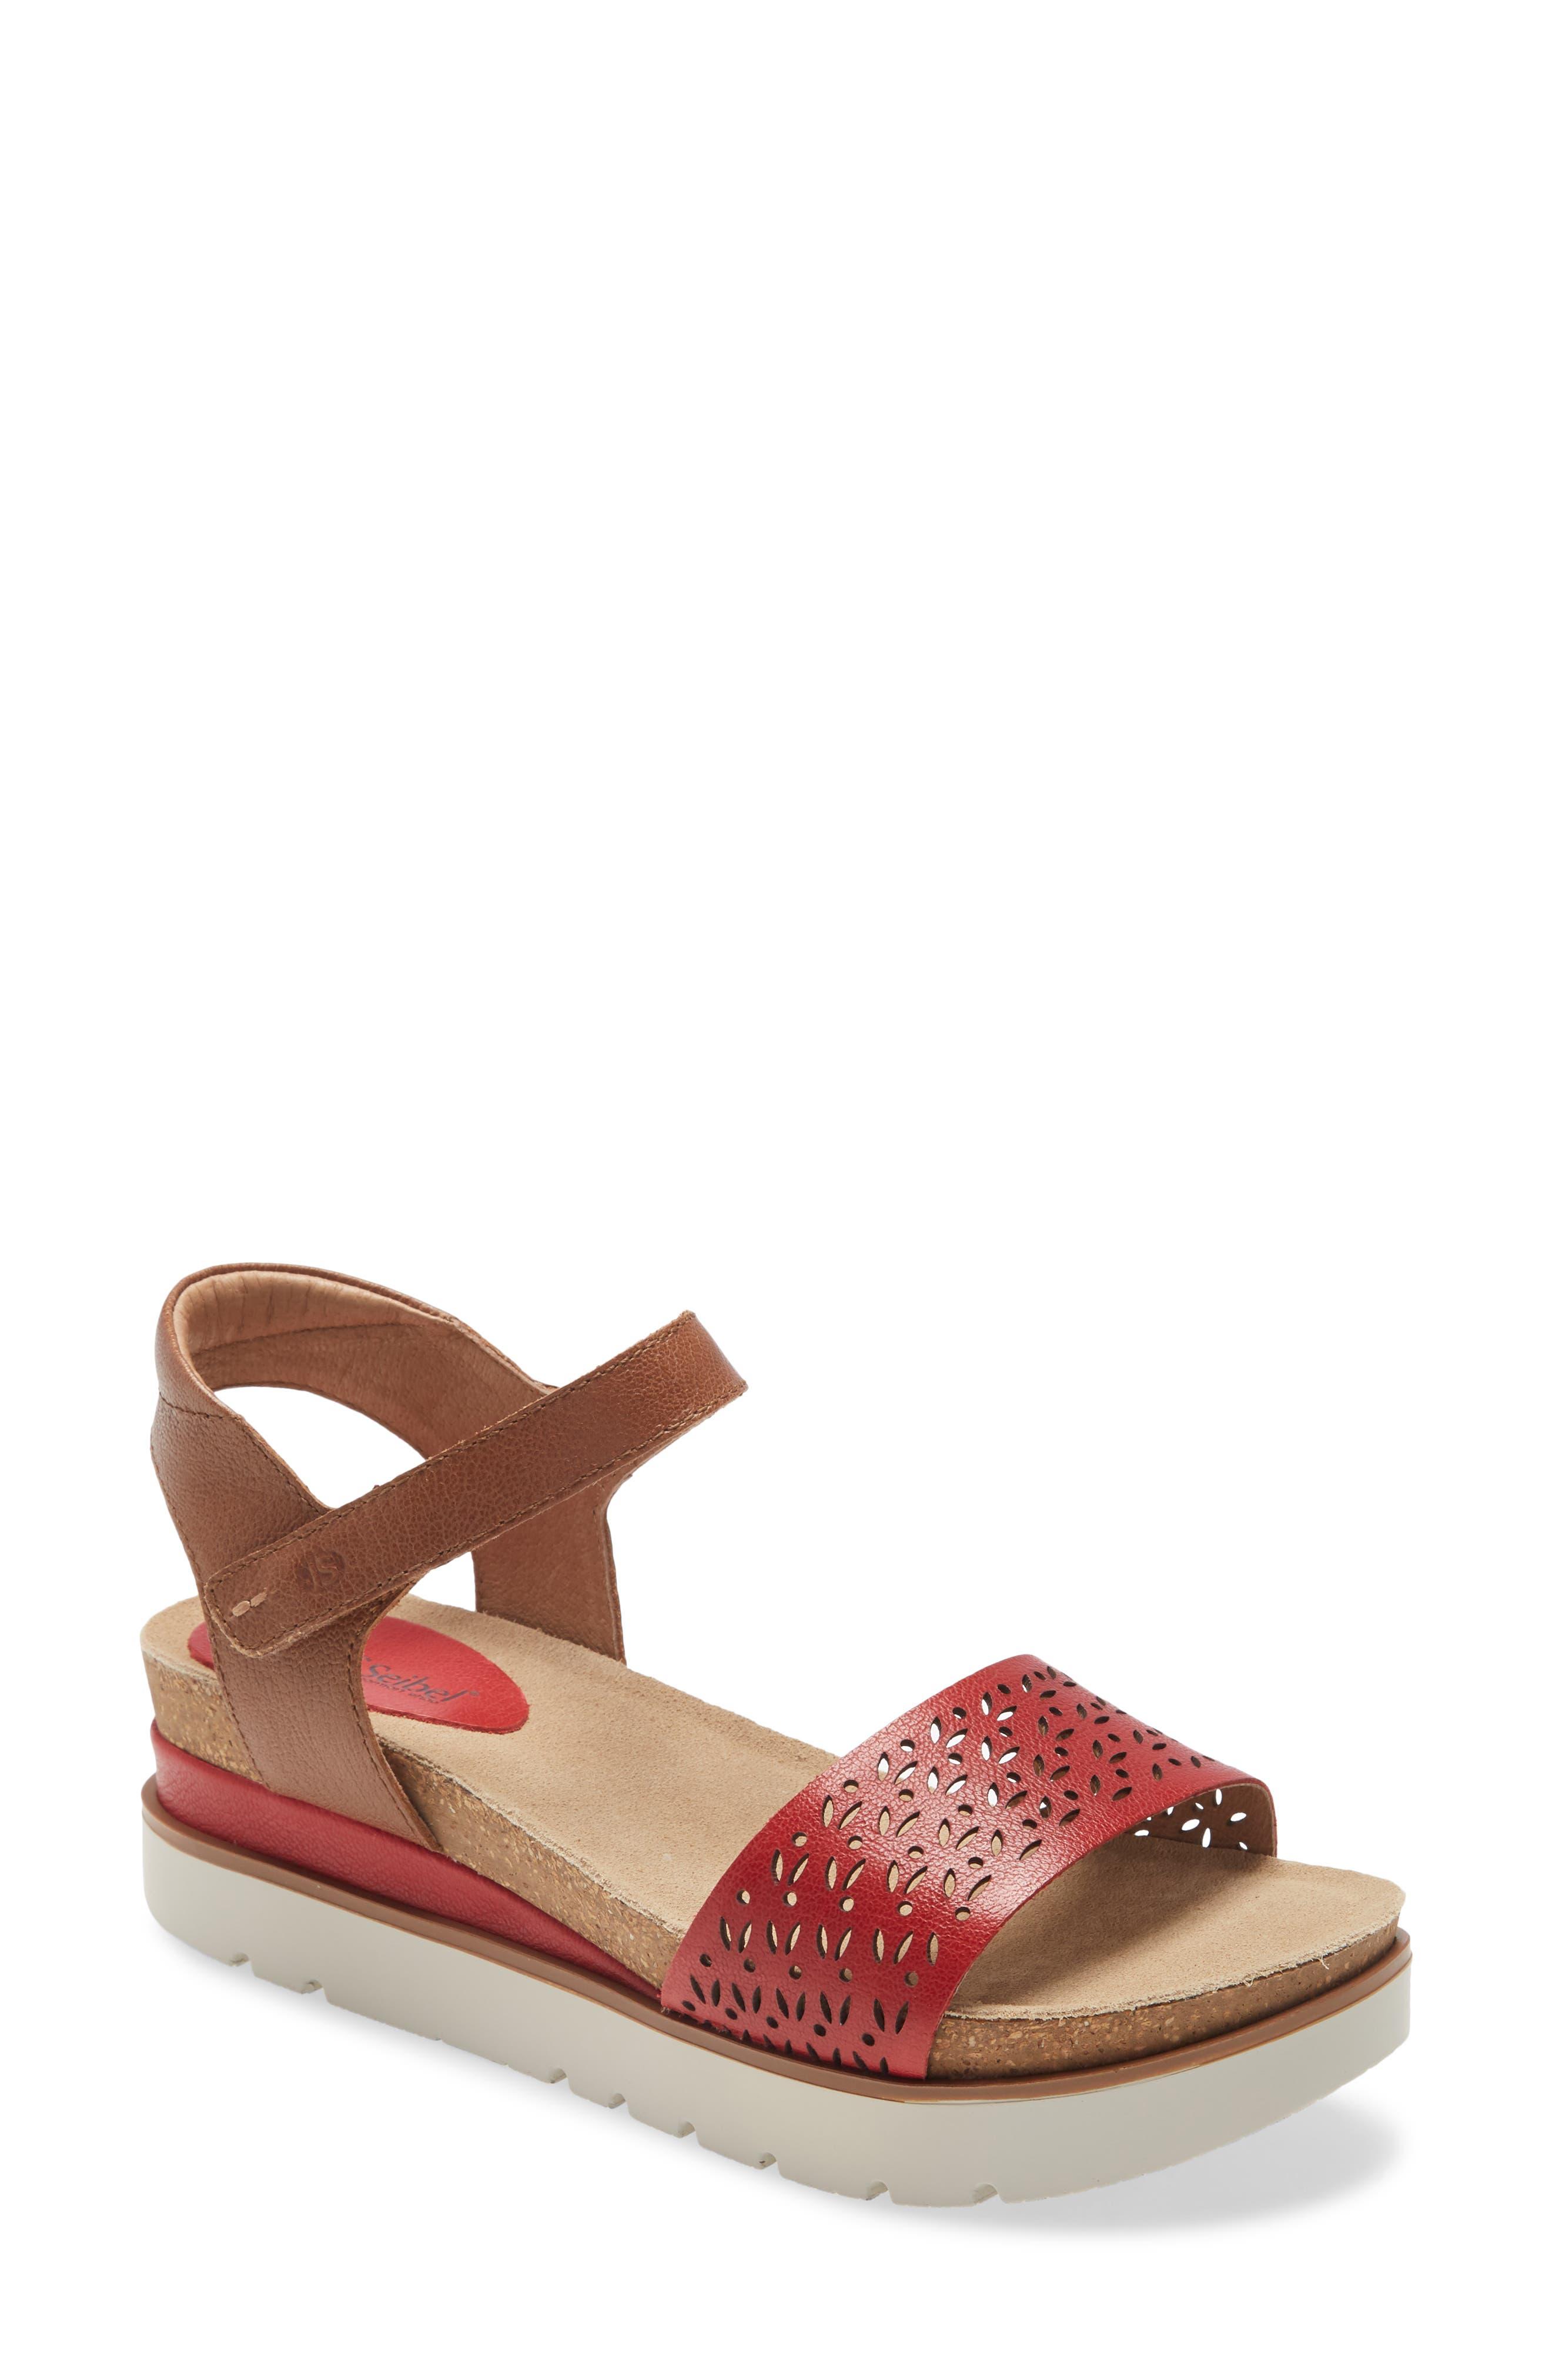 Clea 09 Platform Sandal